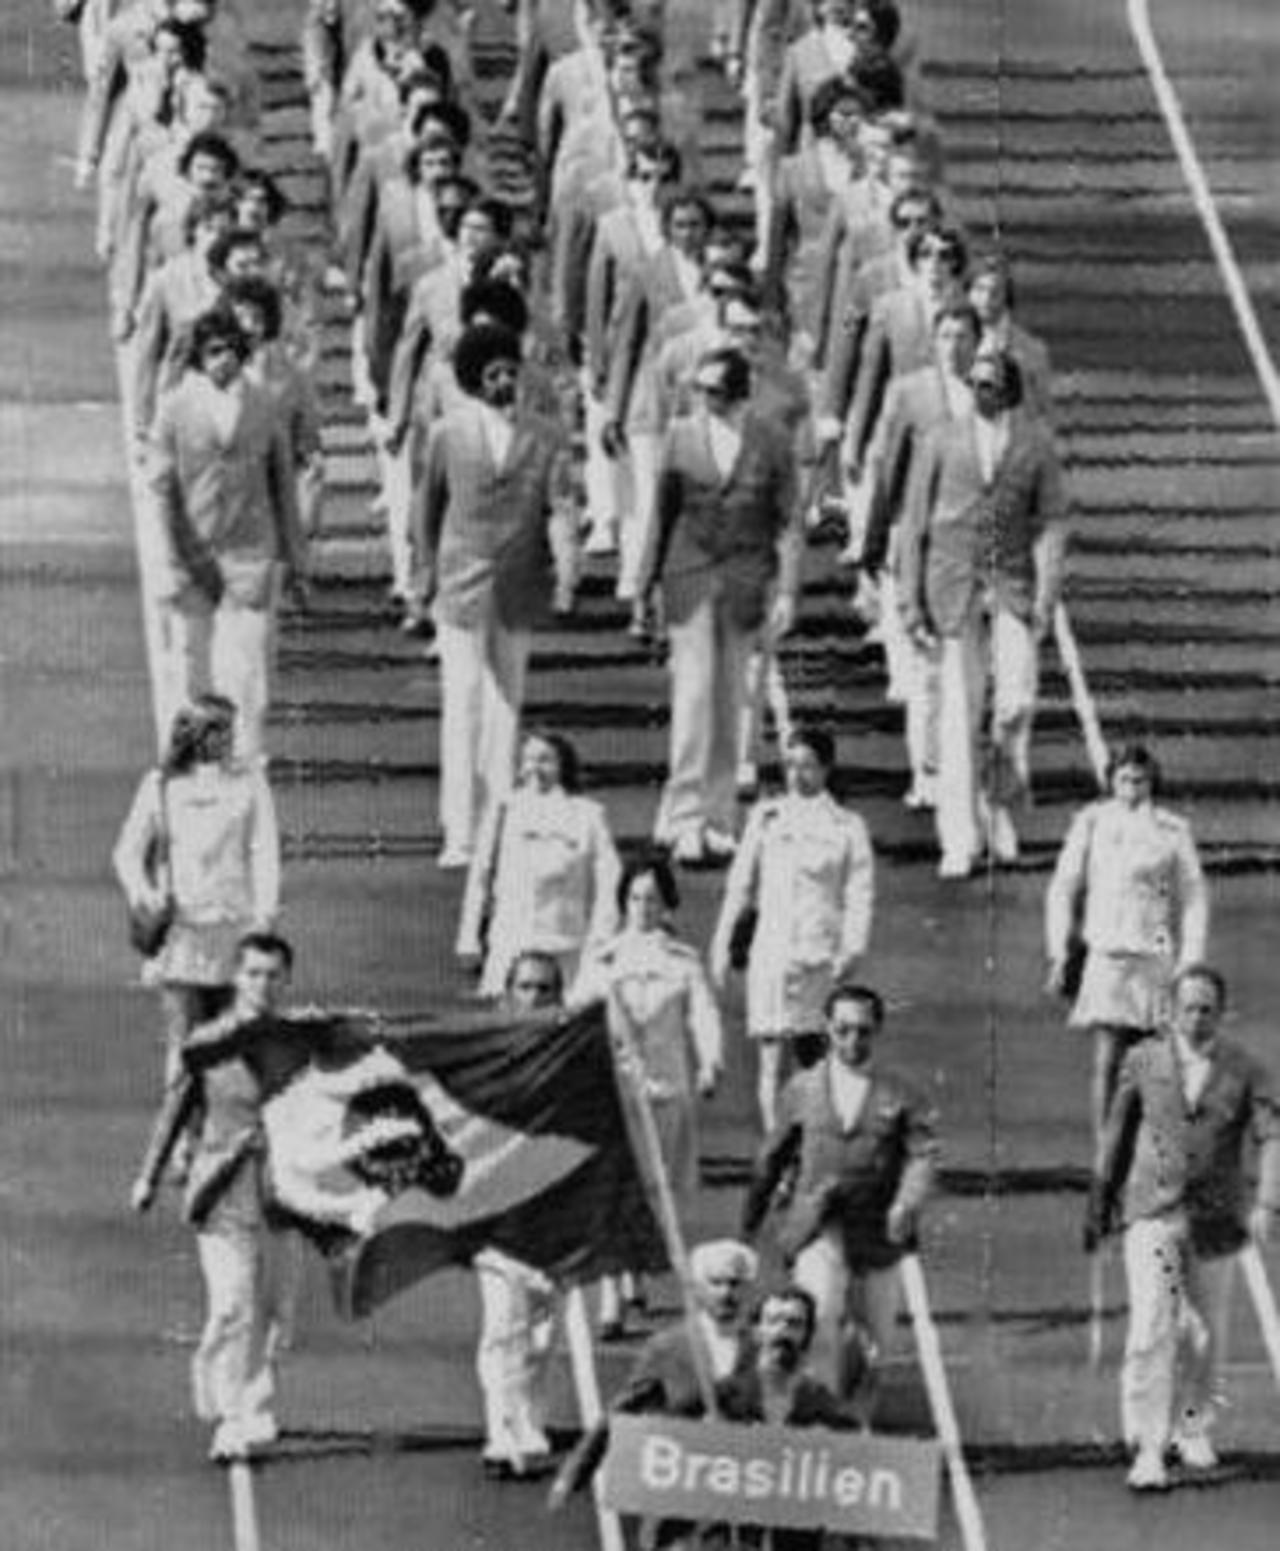 9bf09e1992146 02. Delegação brasileira na abertura das Olimpíadas. Luiz Claudio Menon foi  o porta-bandeira.